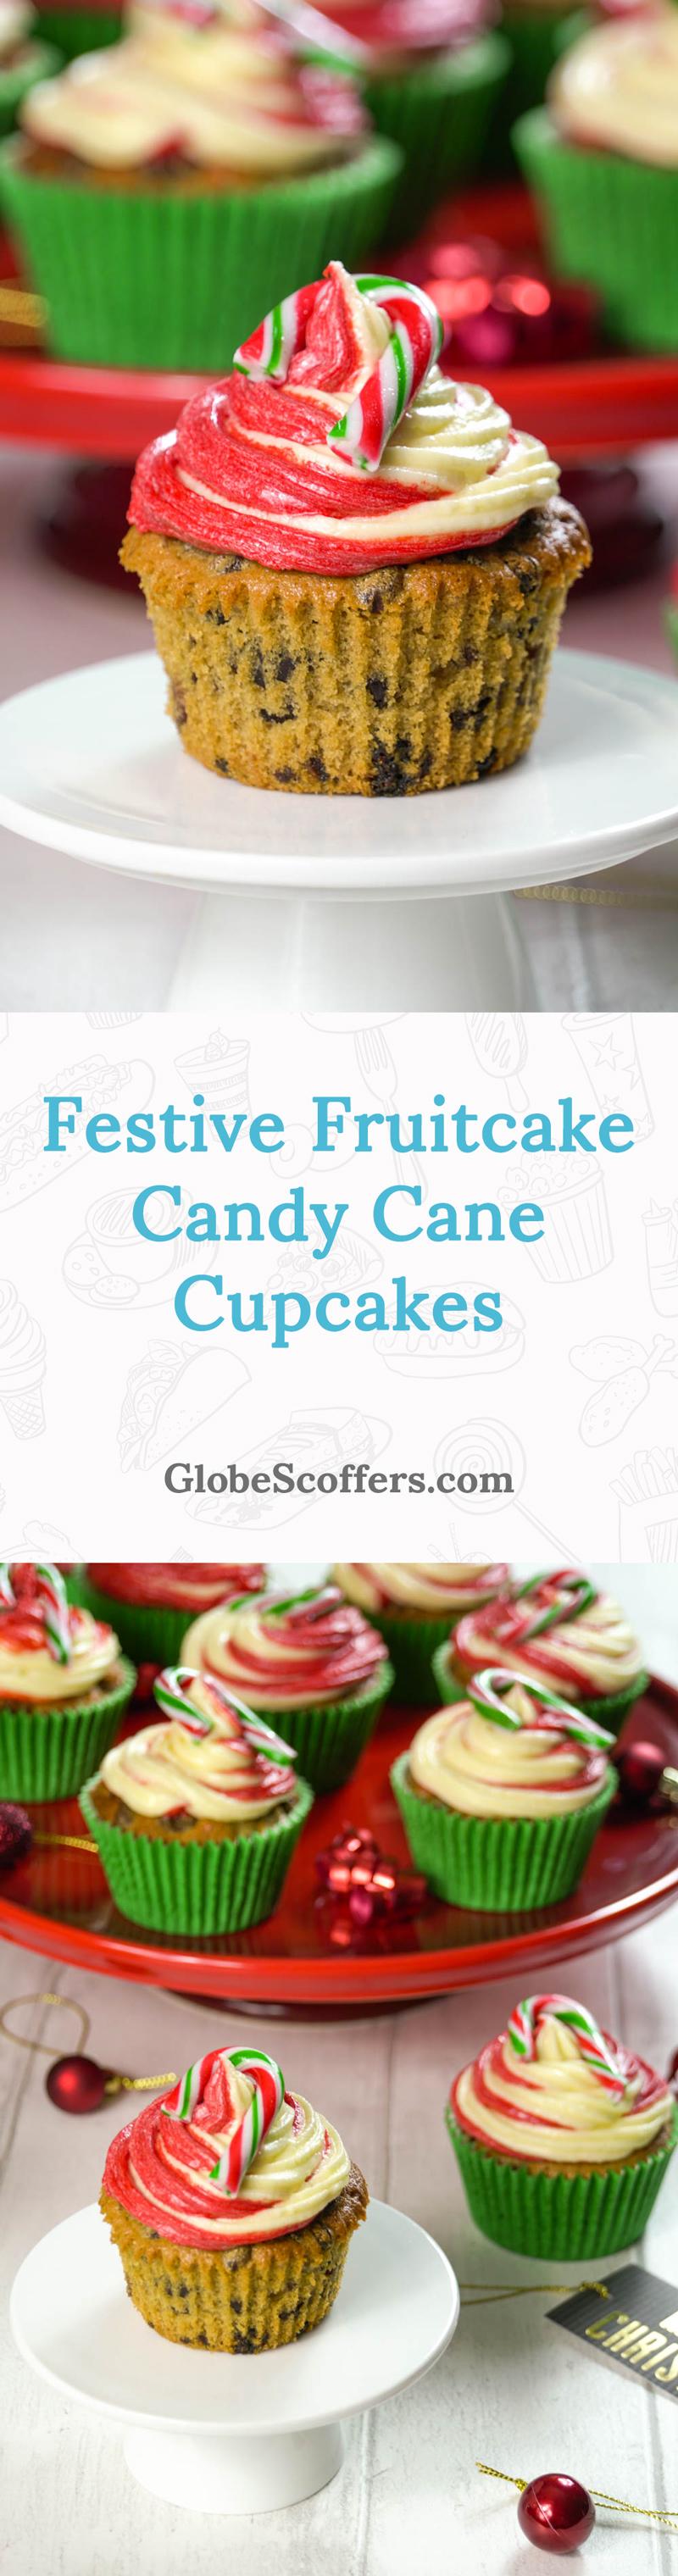 Festive Fruitcake Candy Cane Cupcakes